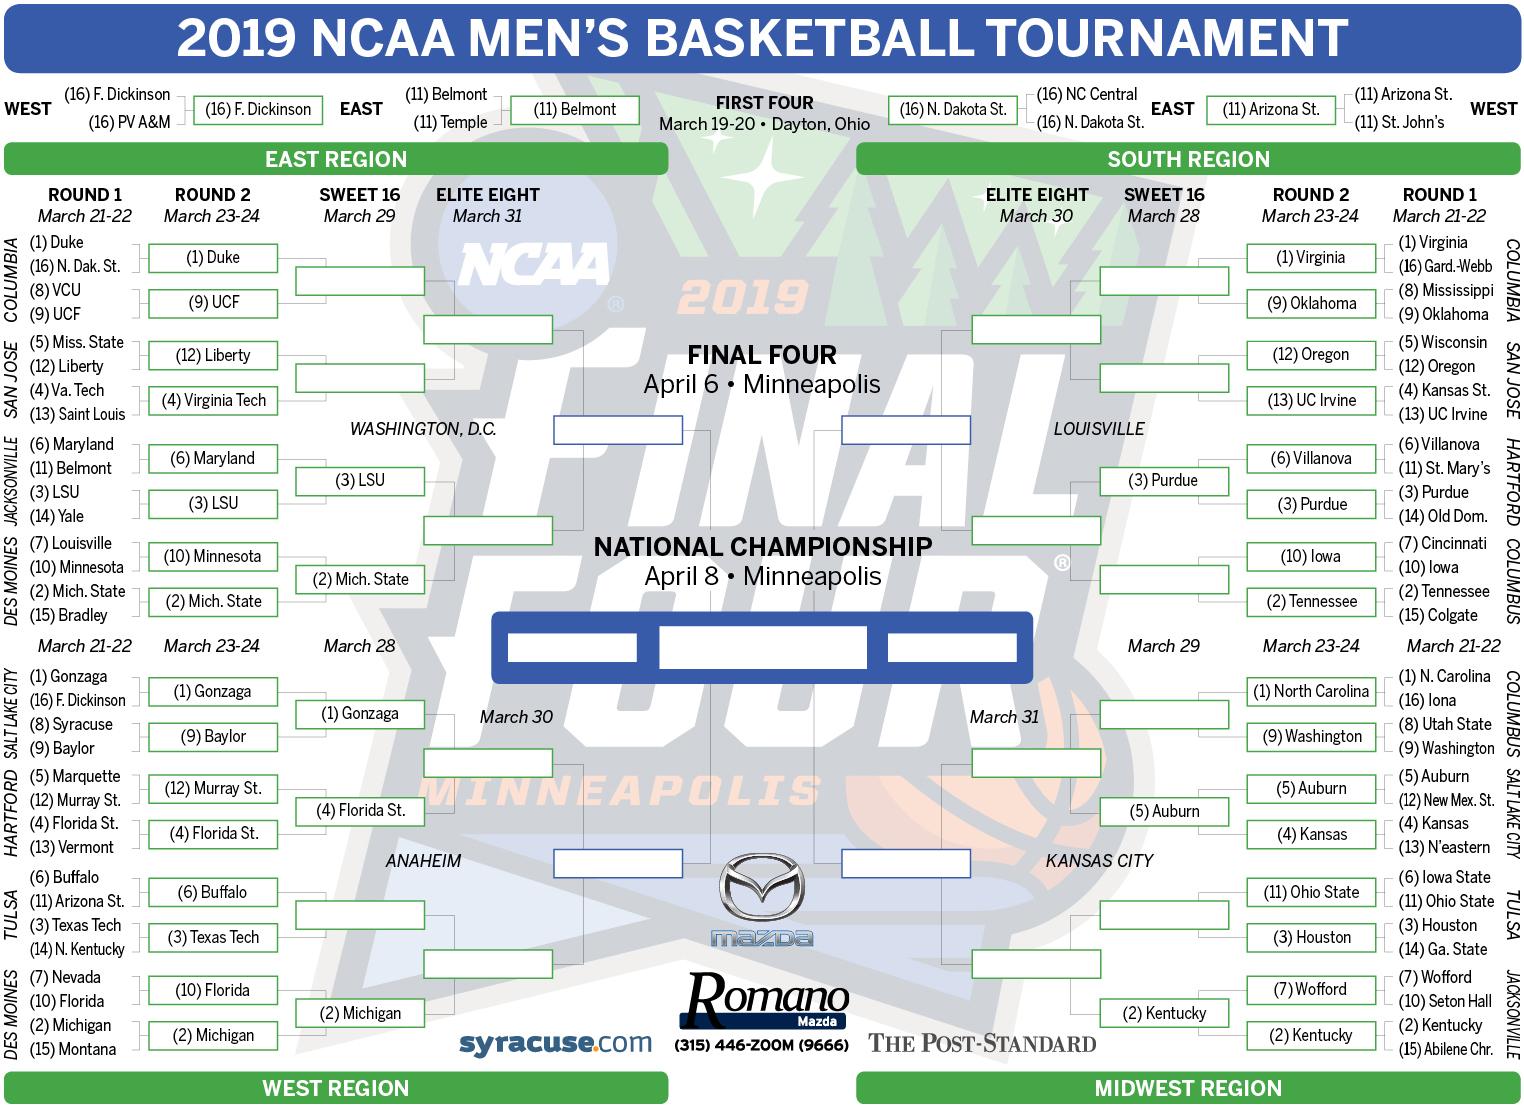 Ncaa Bracket 2019 Update First Four Results And Round 1: NCAA Tournament Bracket 2019 Update: Saturday's Round 2